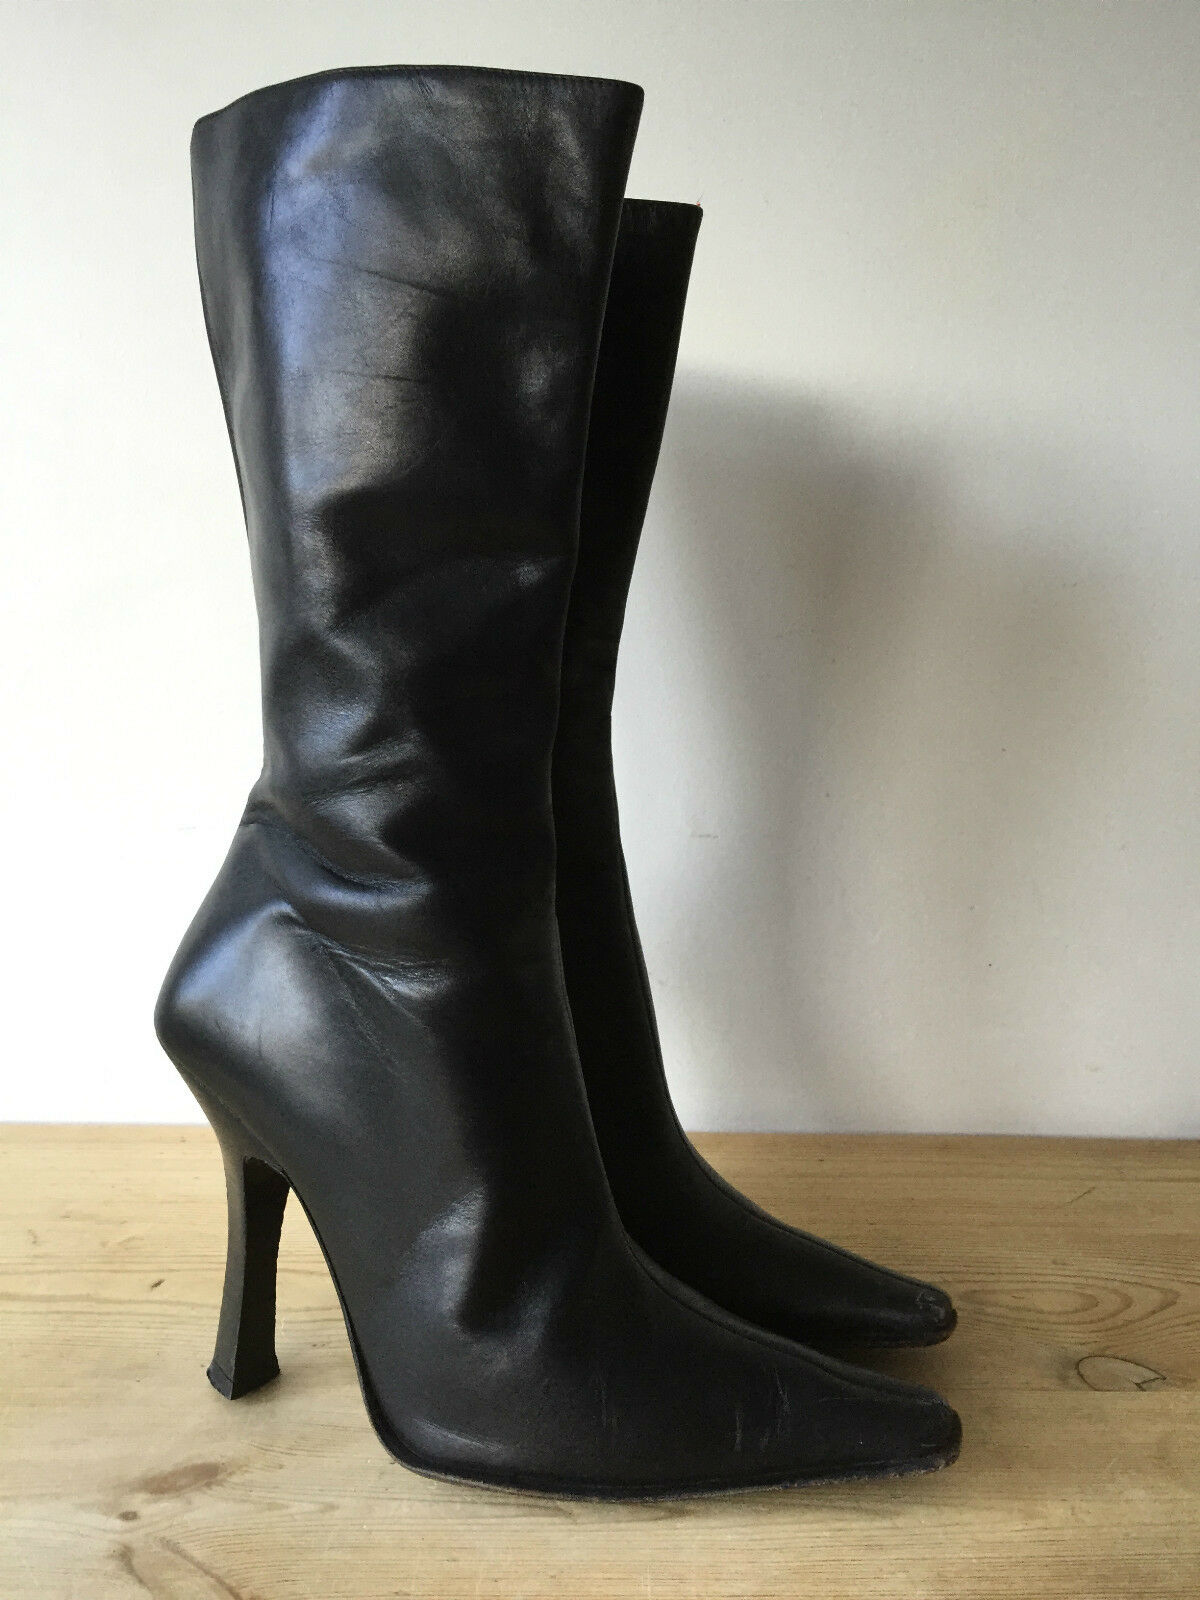 SACHA LADIES BLACK LEATHER MID CALF BOOTS UK6